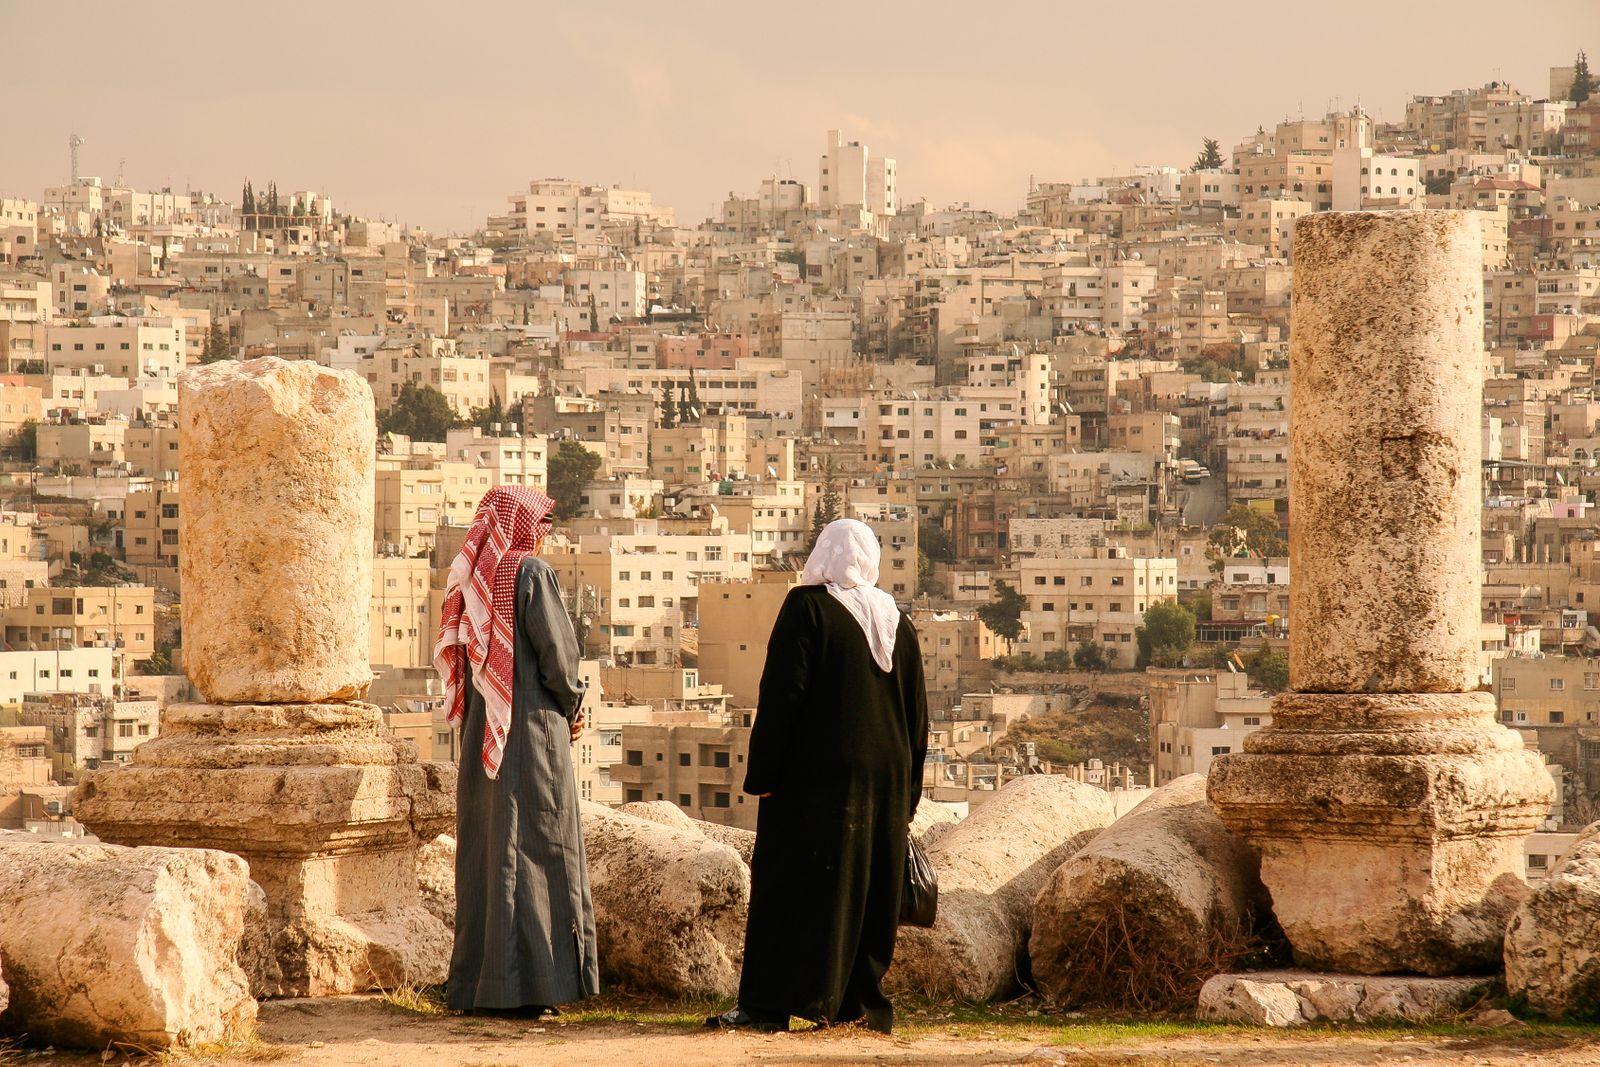 Jordanians Look out over Amman